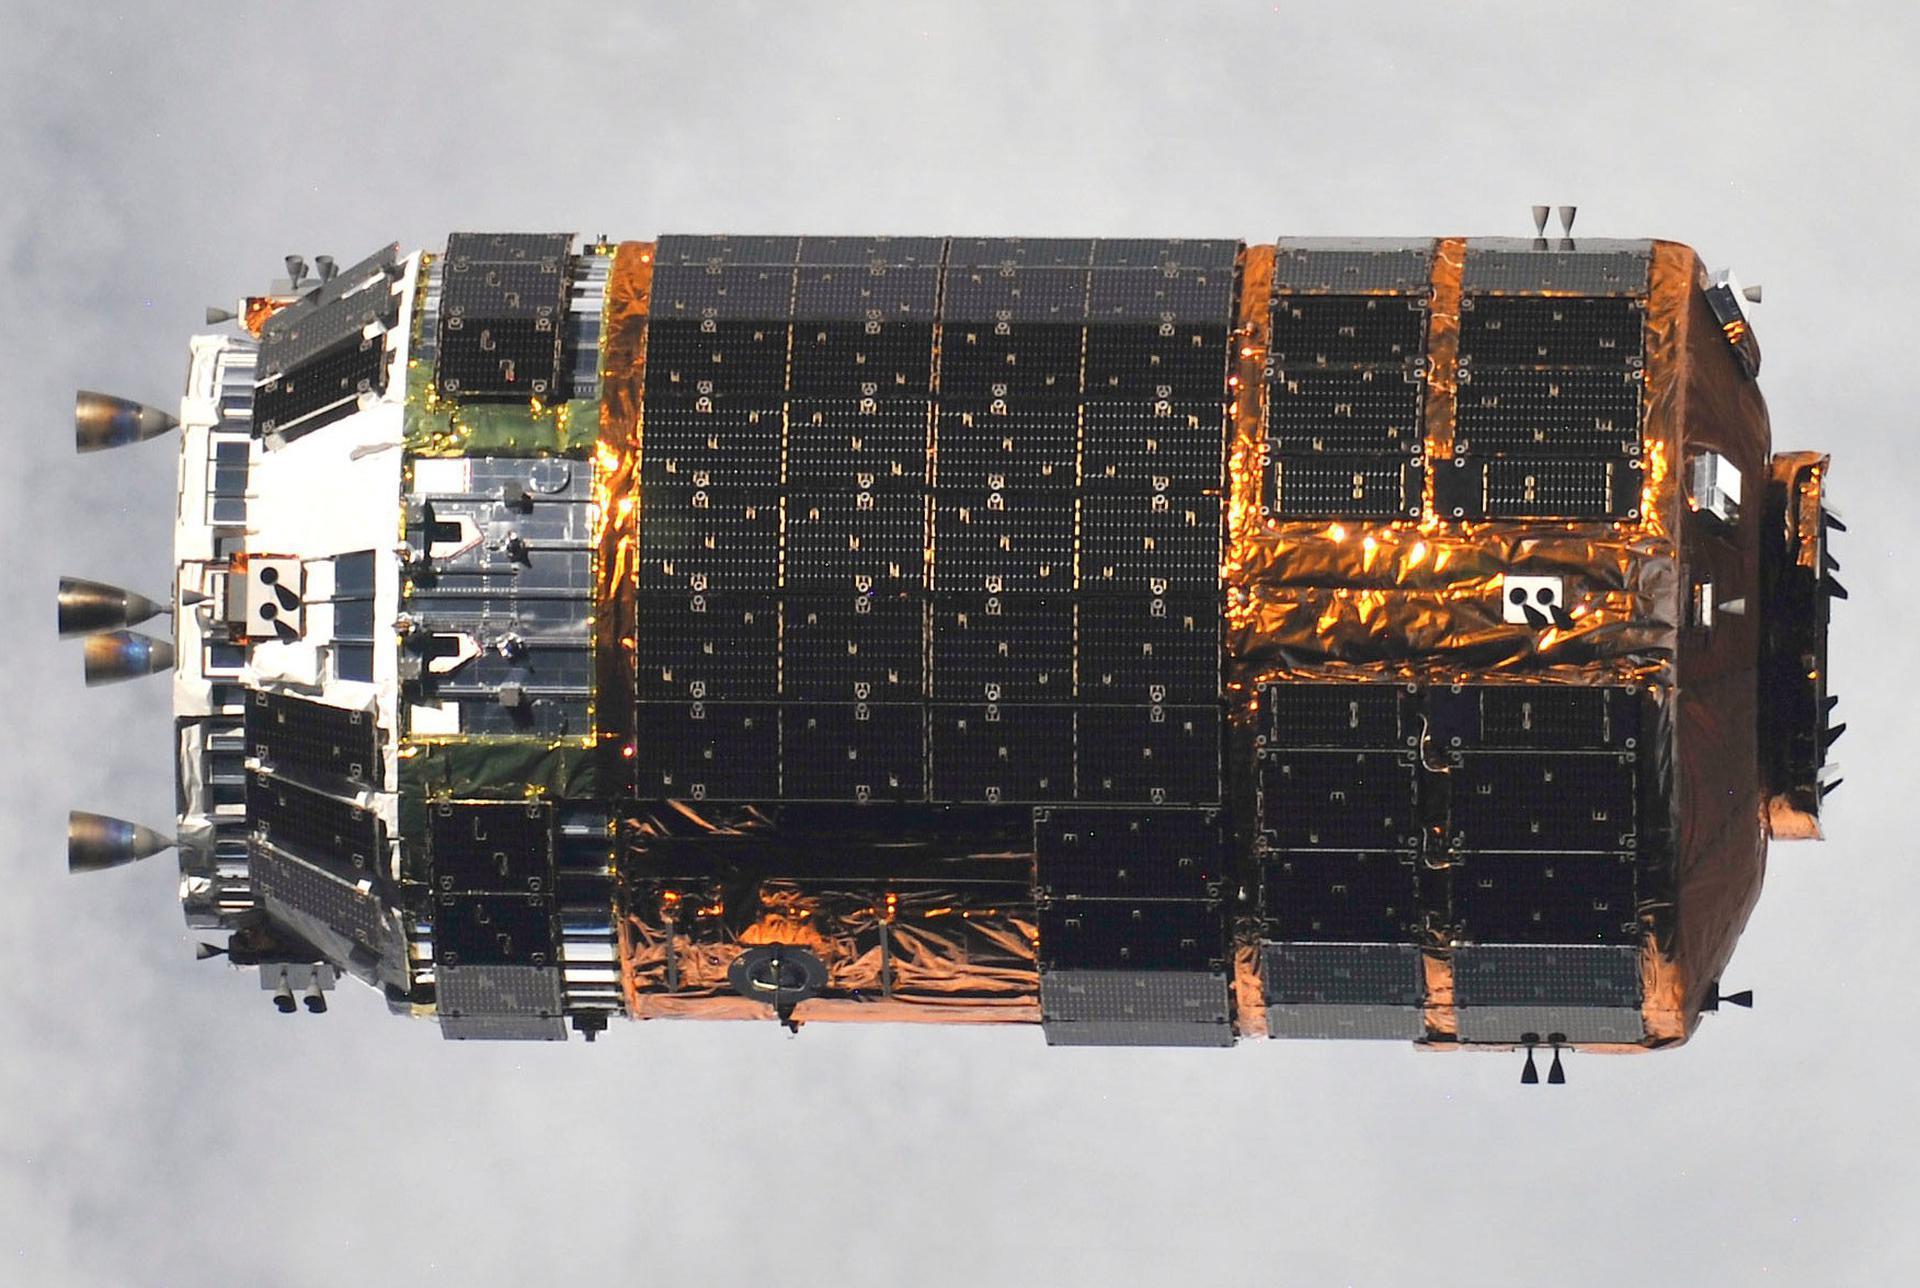 Image of H-II Transfer Vehicle (HTV)